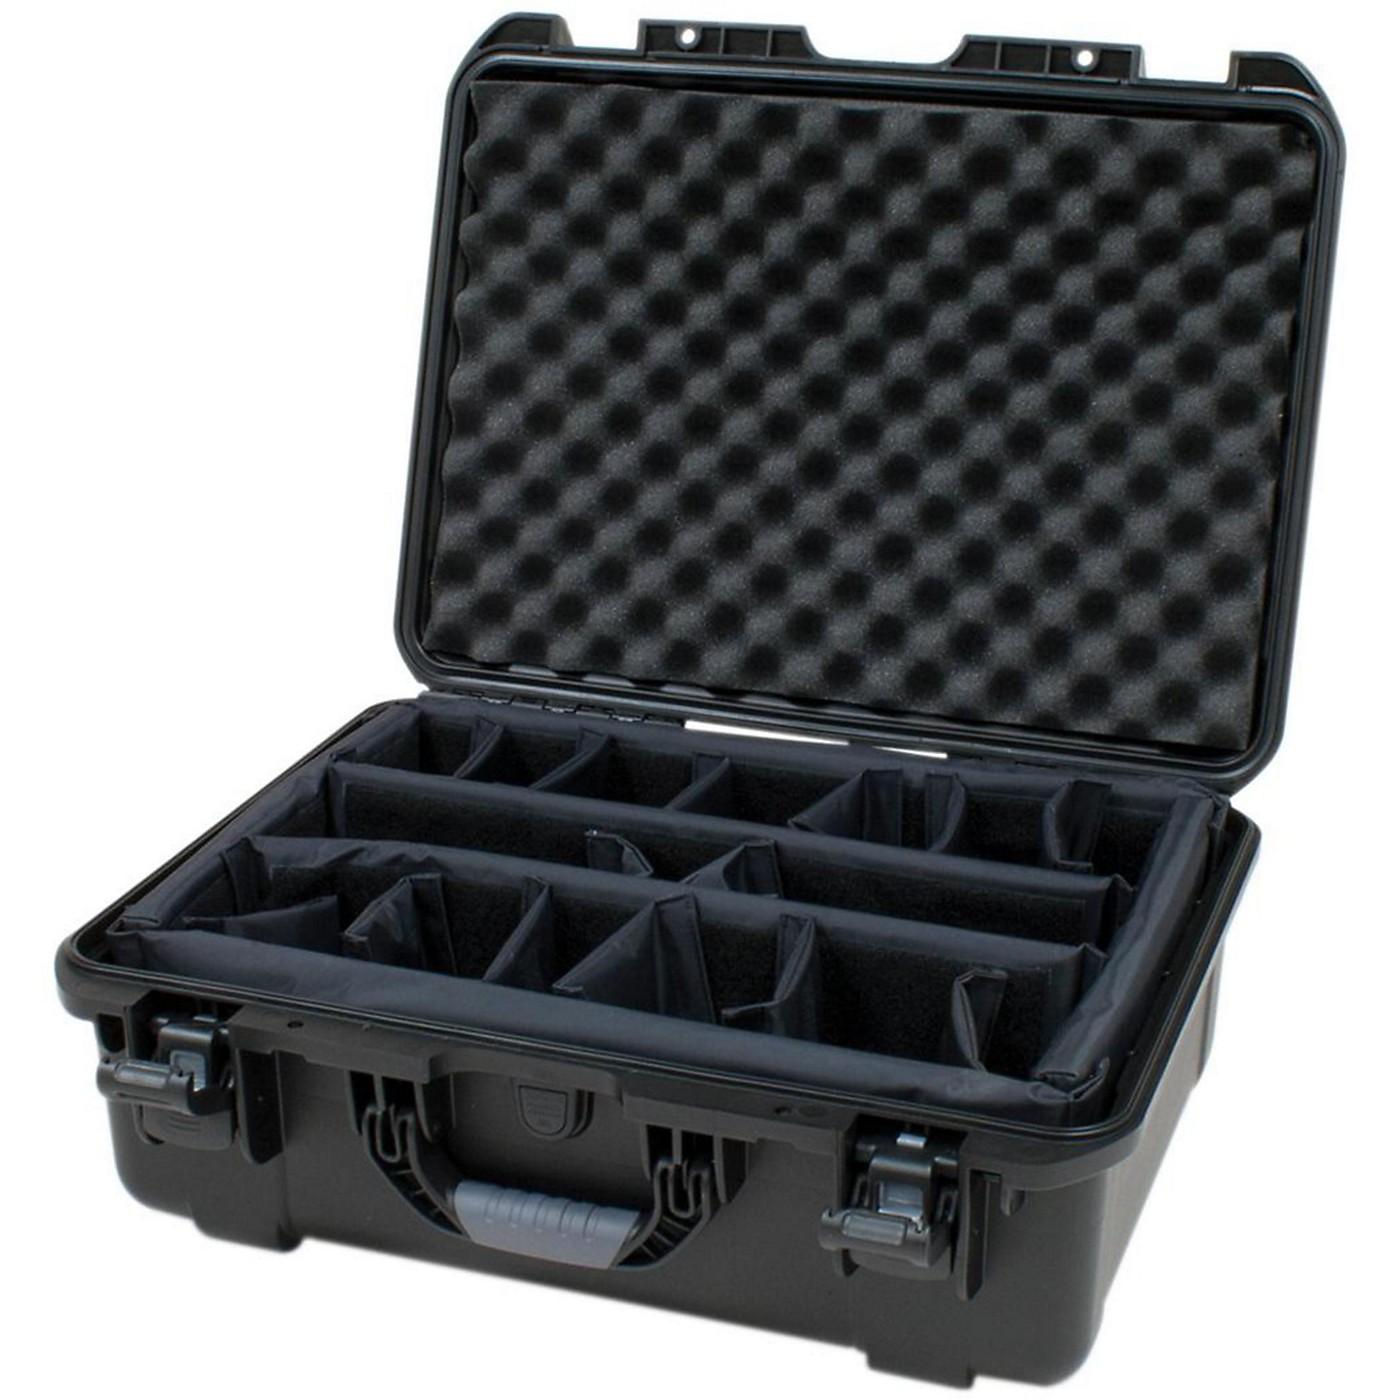 Gator GU-2011-07-WPDV Waterproof Injection Molded Case thumbnail